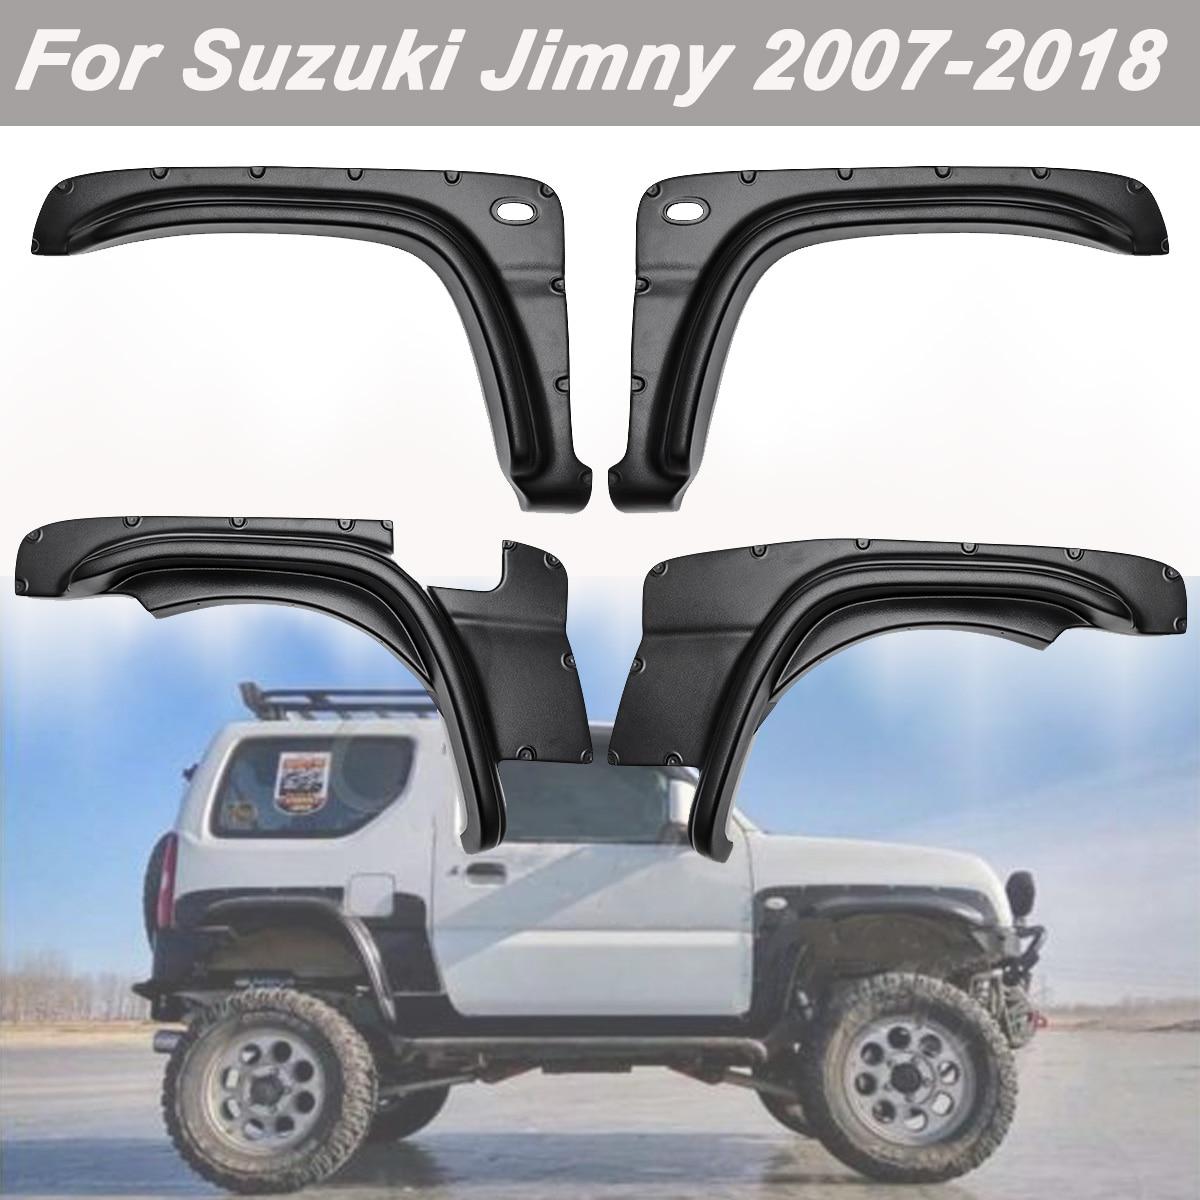 4 Pcs Auto Sopracciglio Ruota Arco Tondo Parafango Mud Flaps Parafanghi Paraspruzzi Per Suzuki jimny 2007-2017